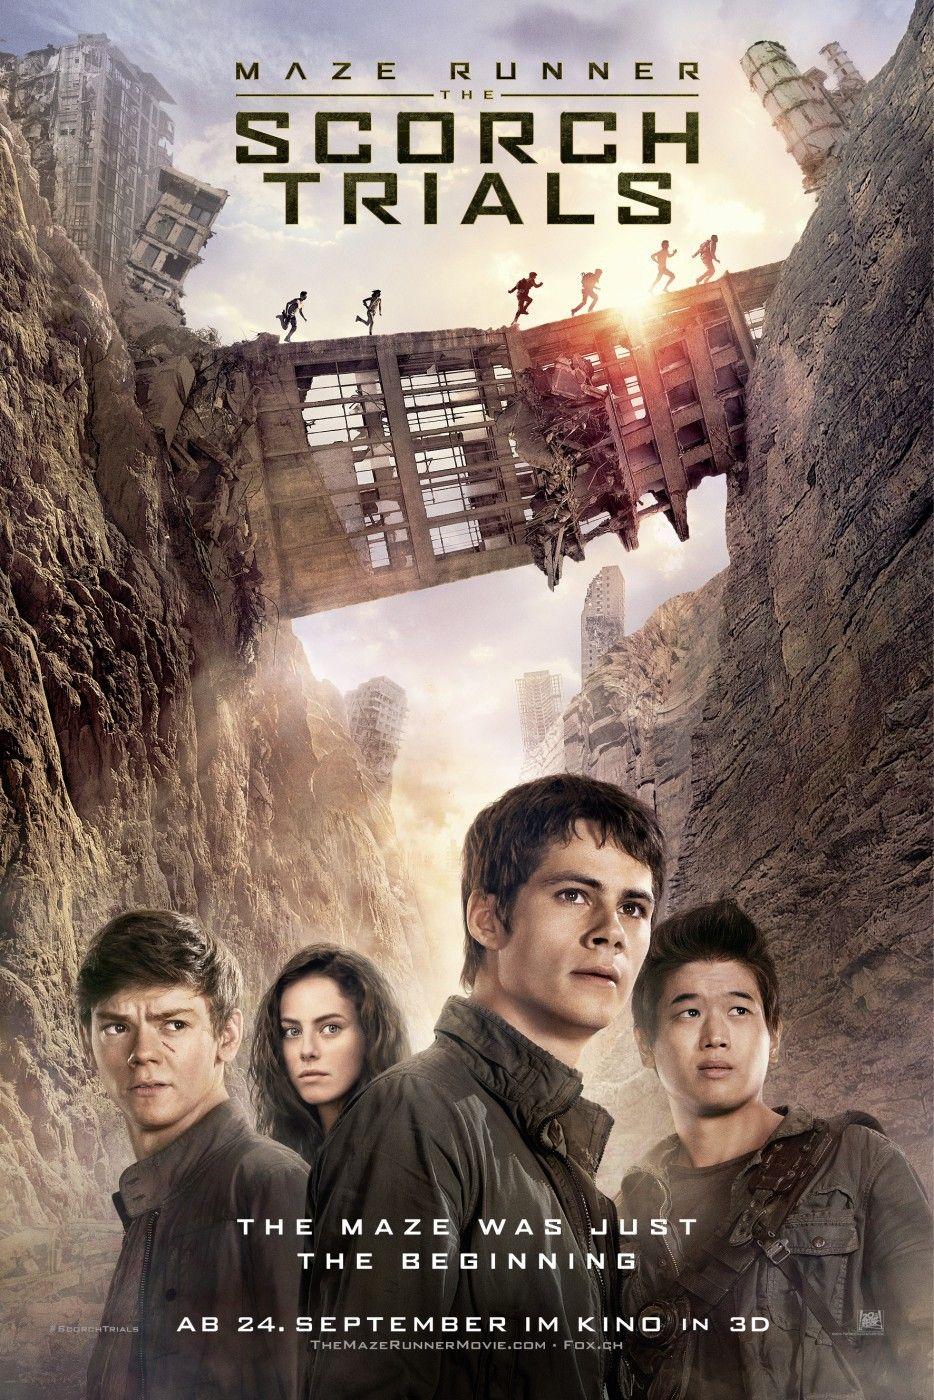 The maze runner movie download free